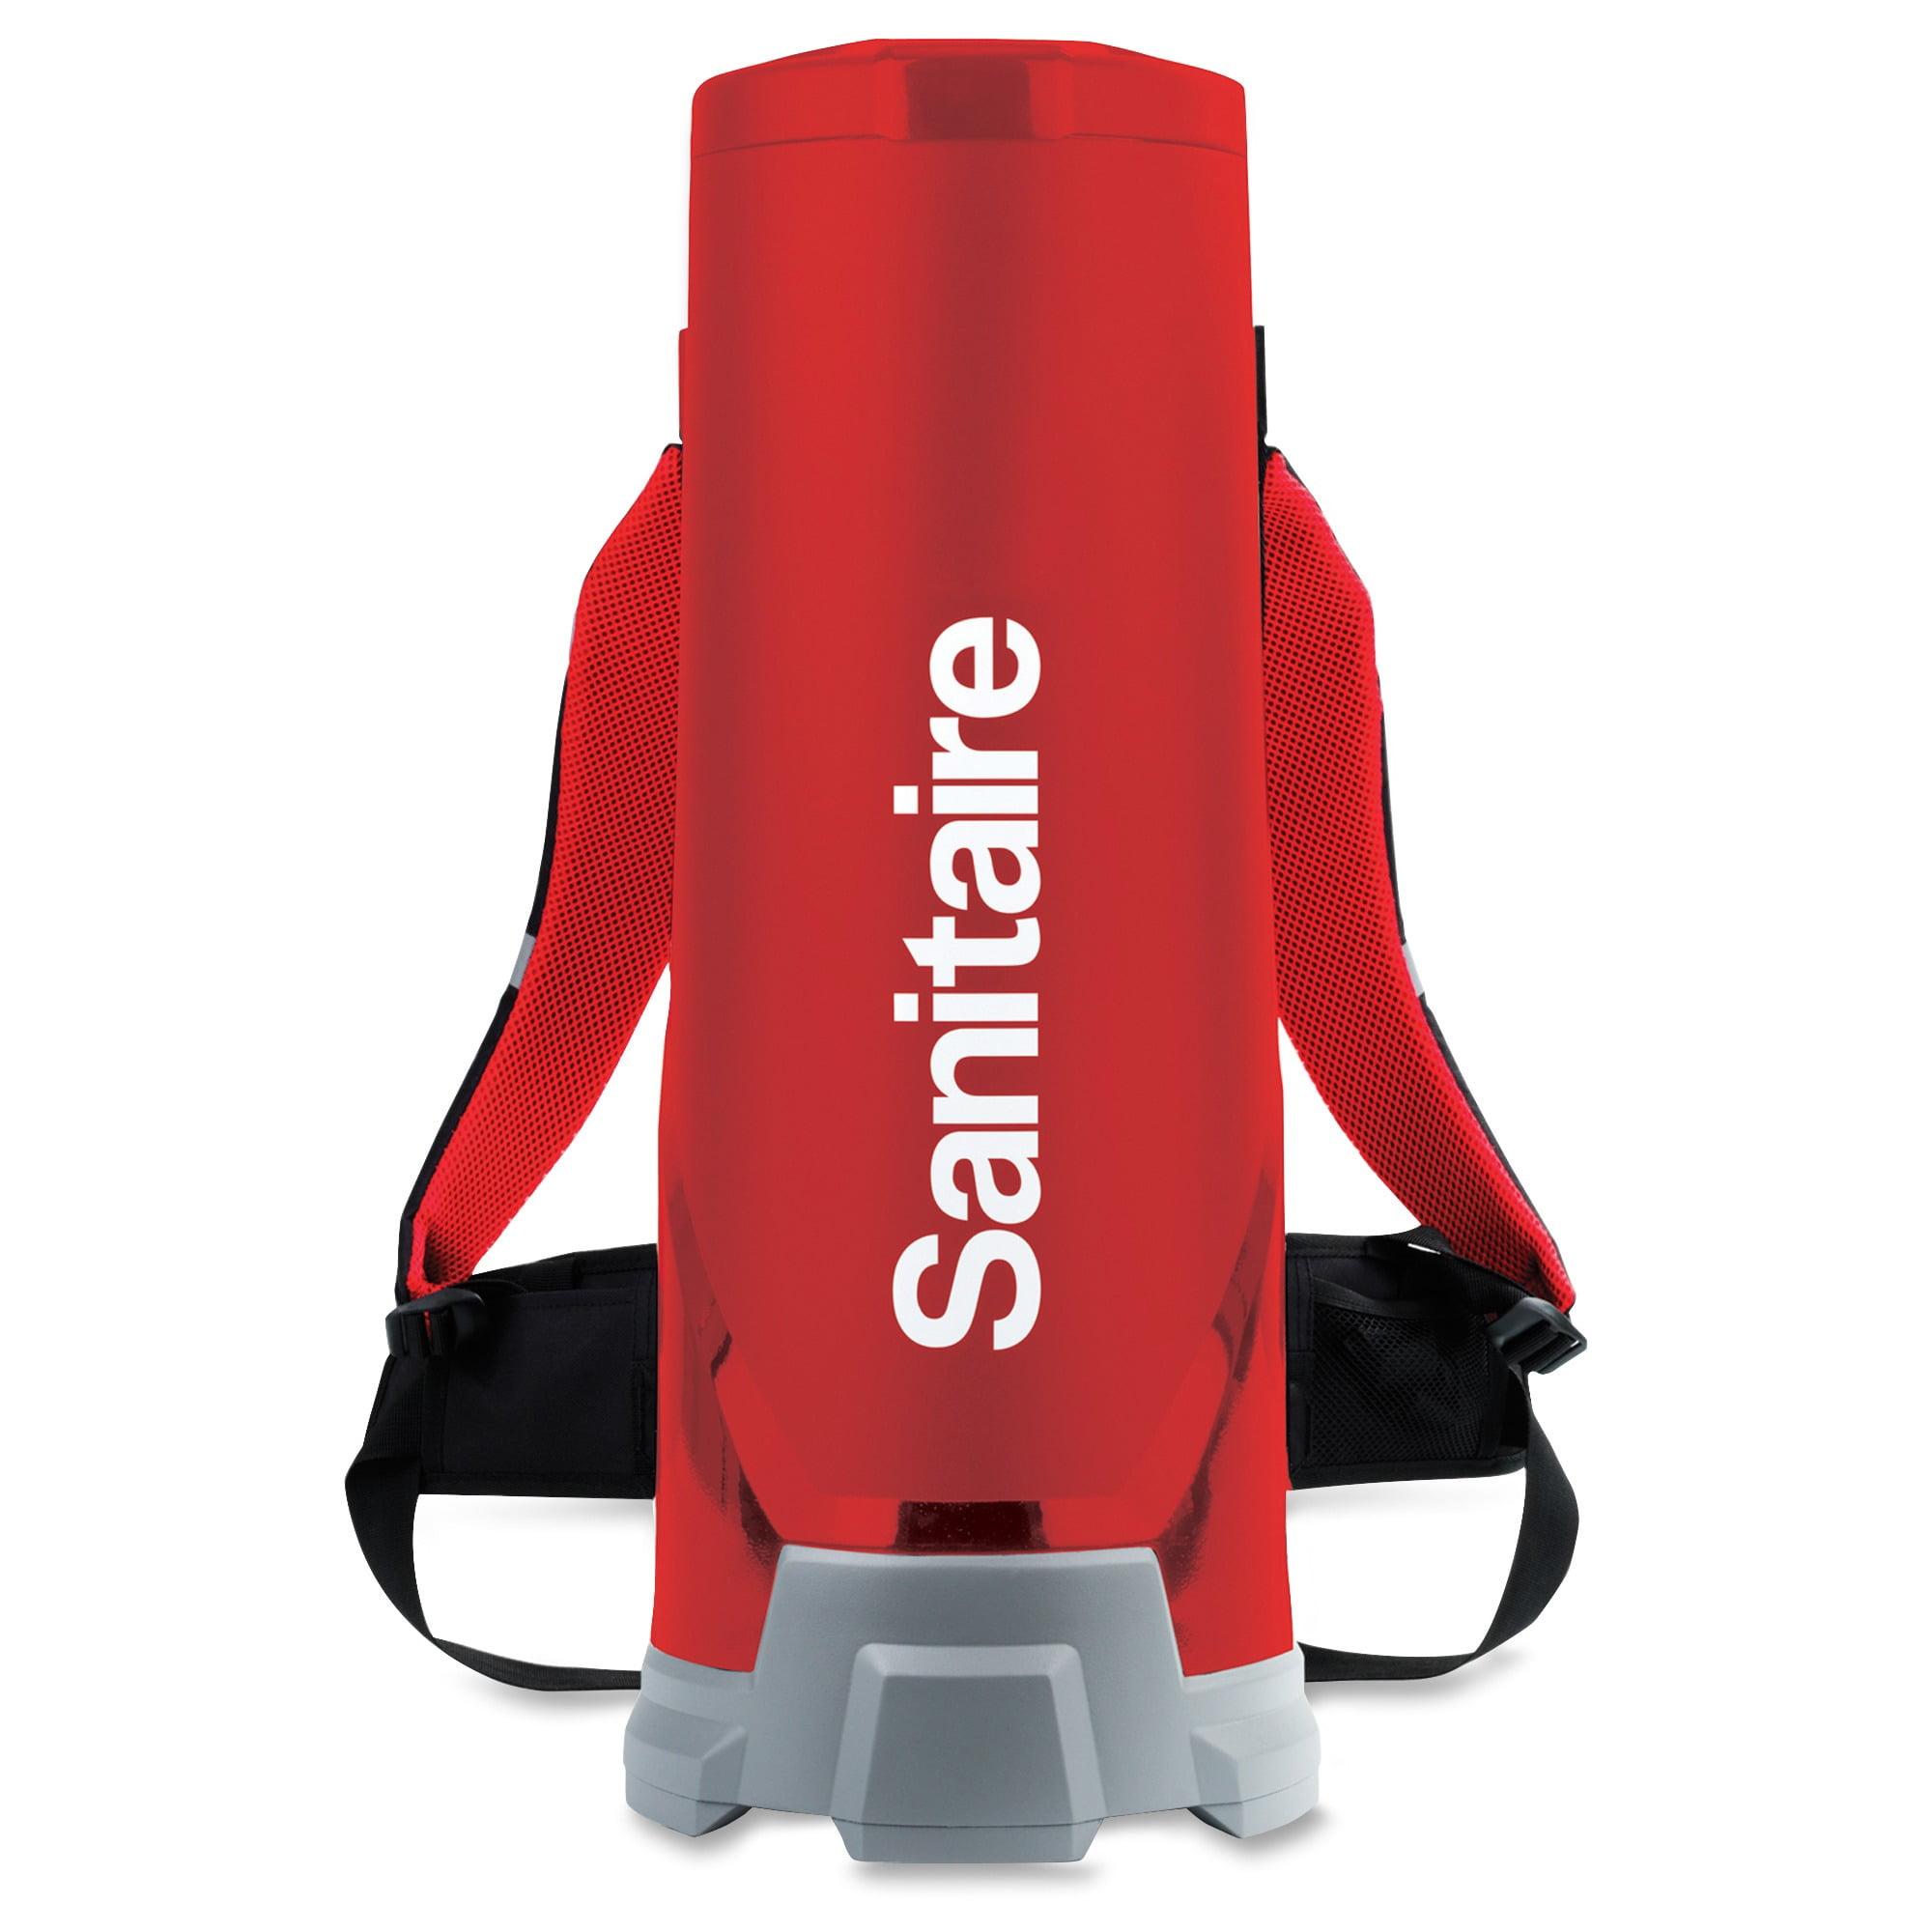 Sanitaire 10q Backpack Vacuum - 1.50 Gal - Red (530b)